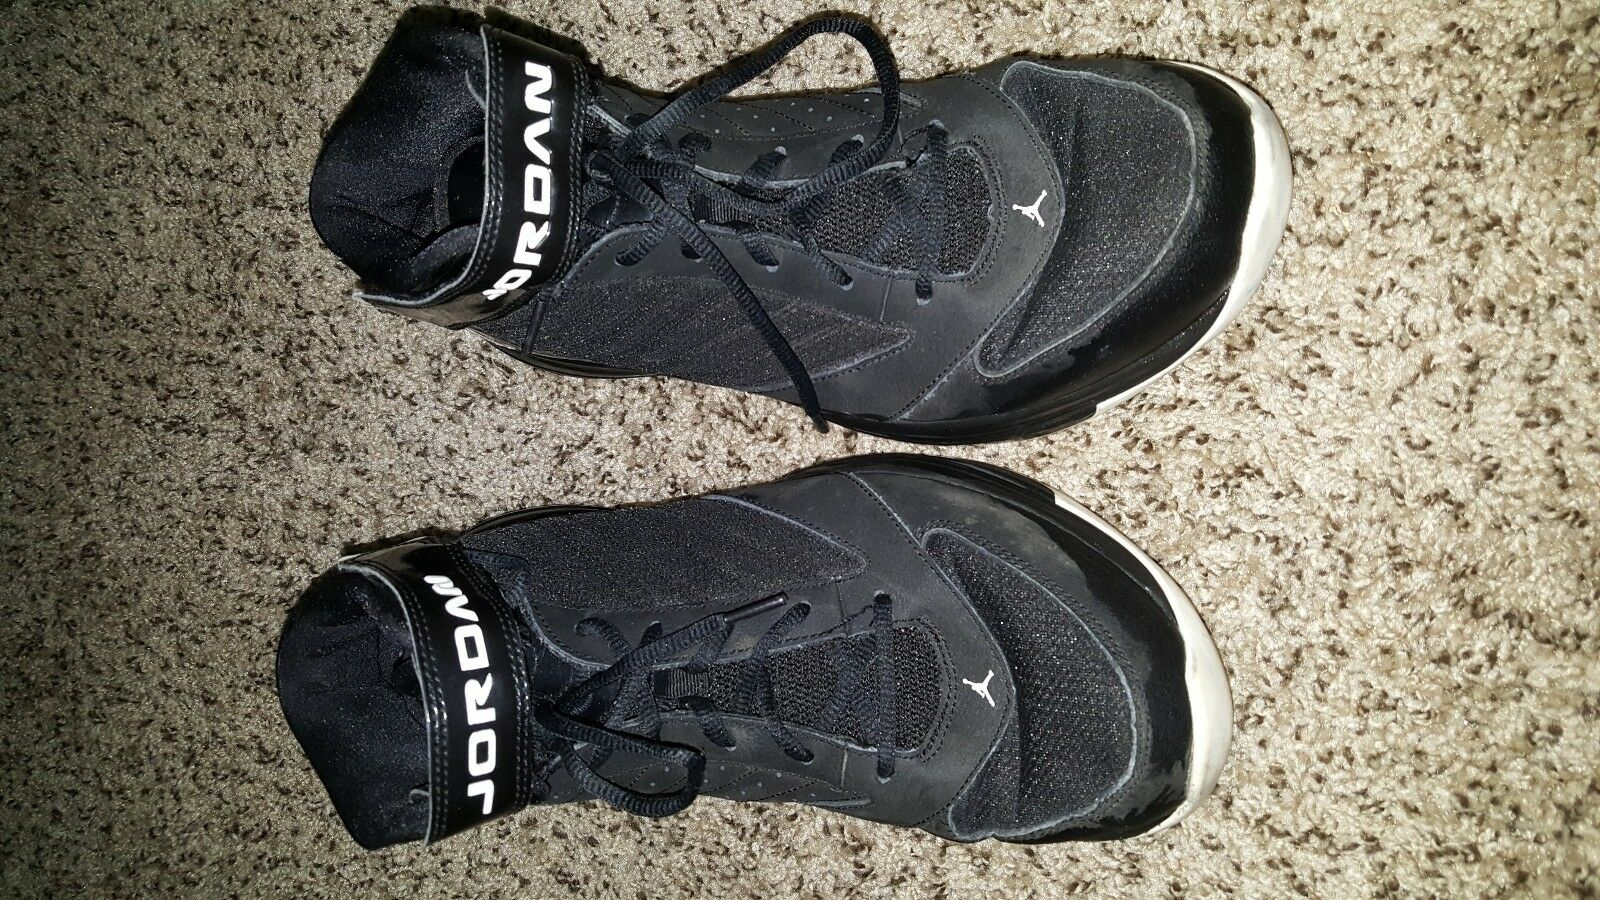 Nike JORDAN BCT MID 3 684829-010 RETRO SHADOW MENS BASKETBALL FLIGHT 45 BLACK BU